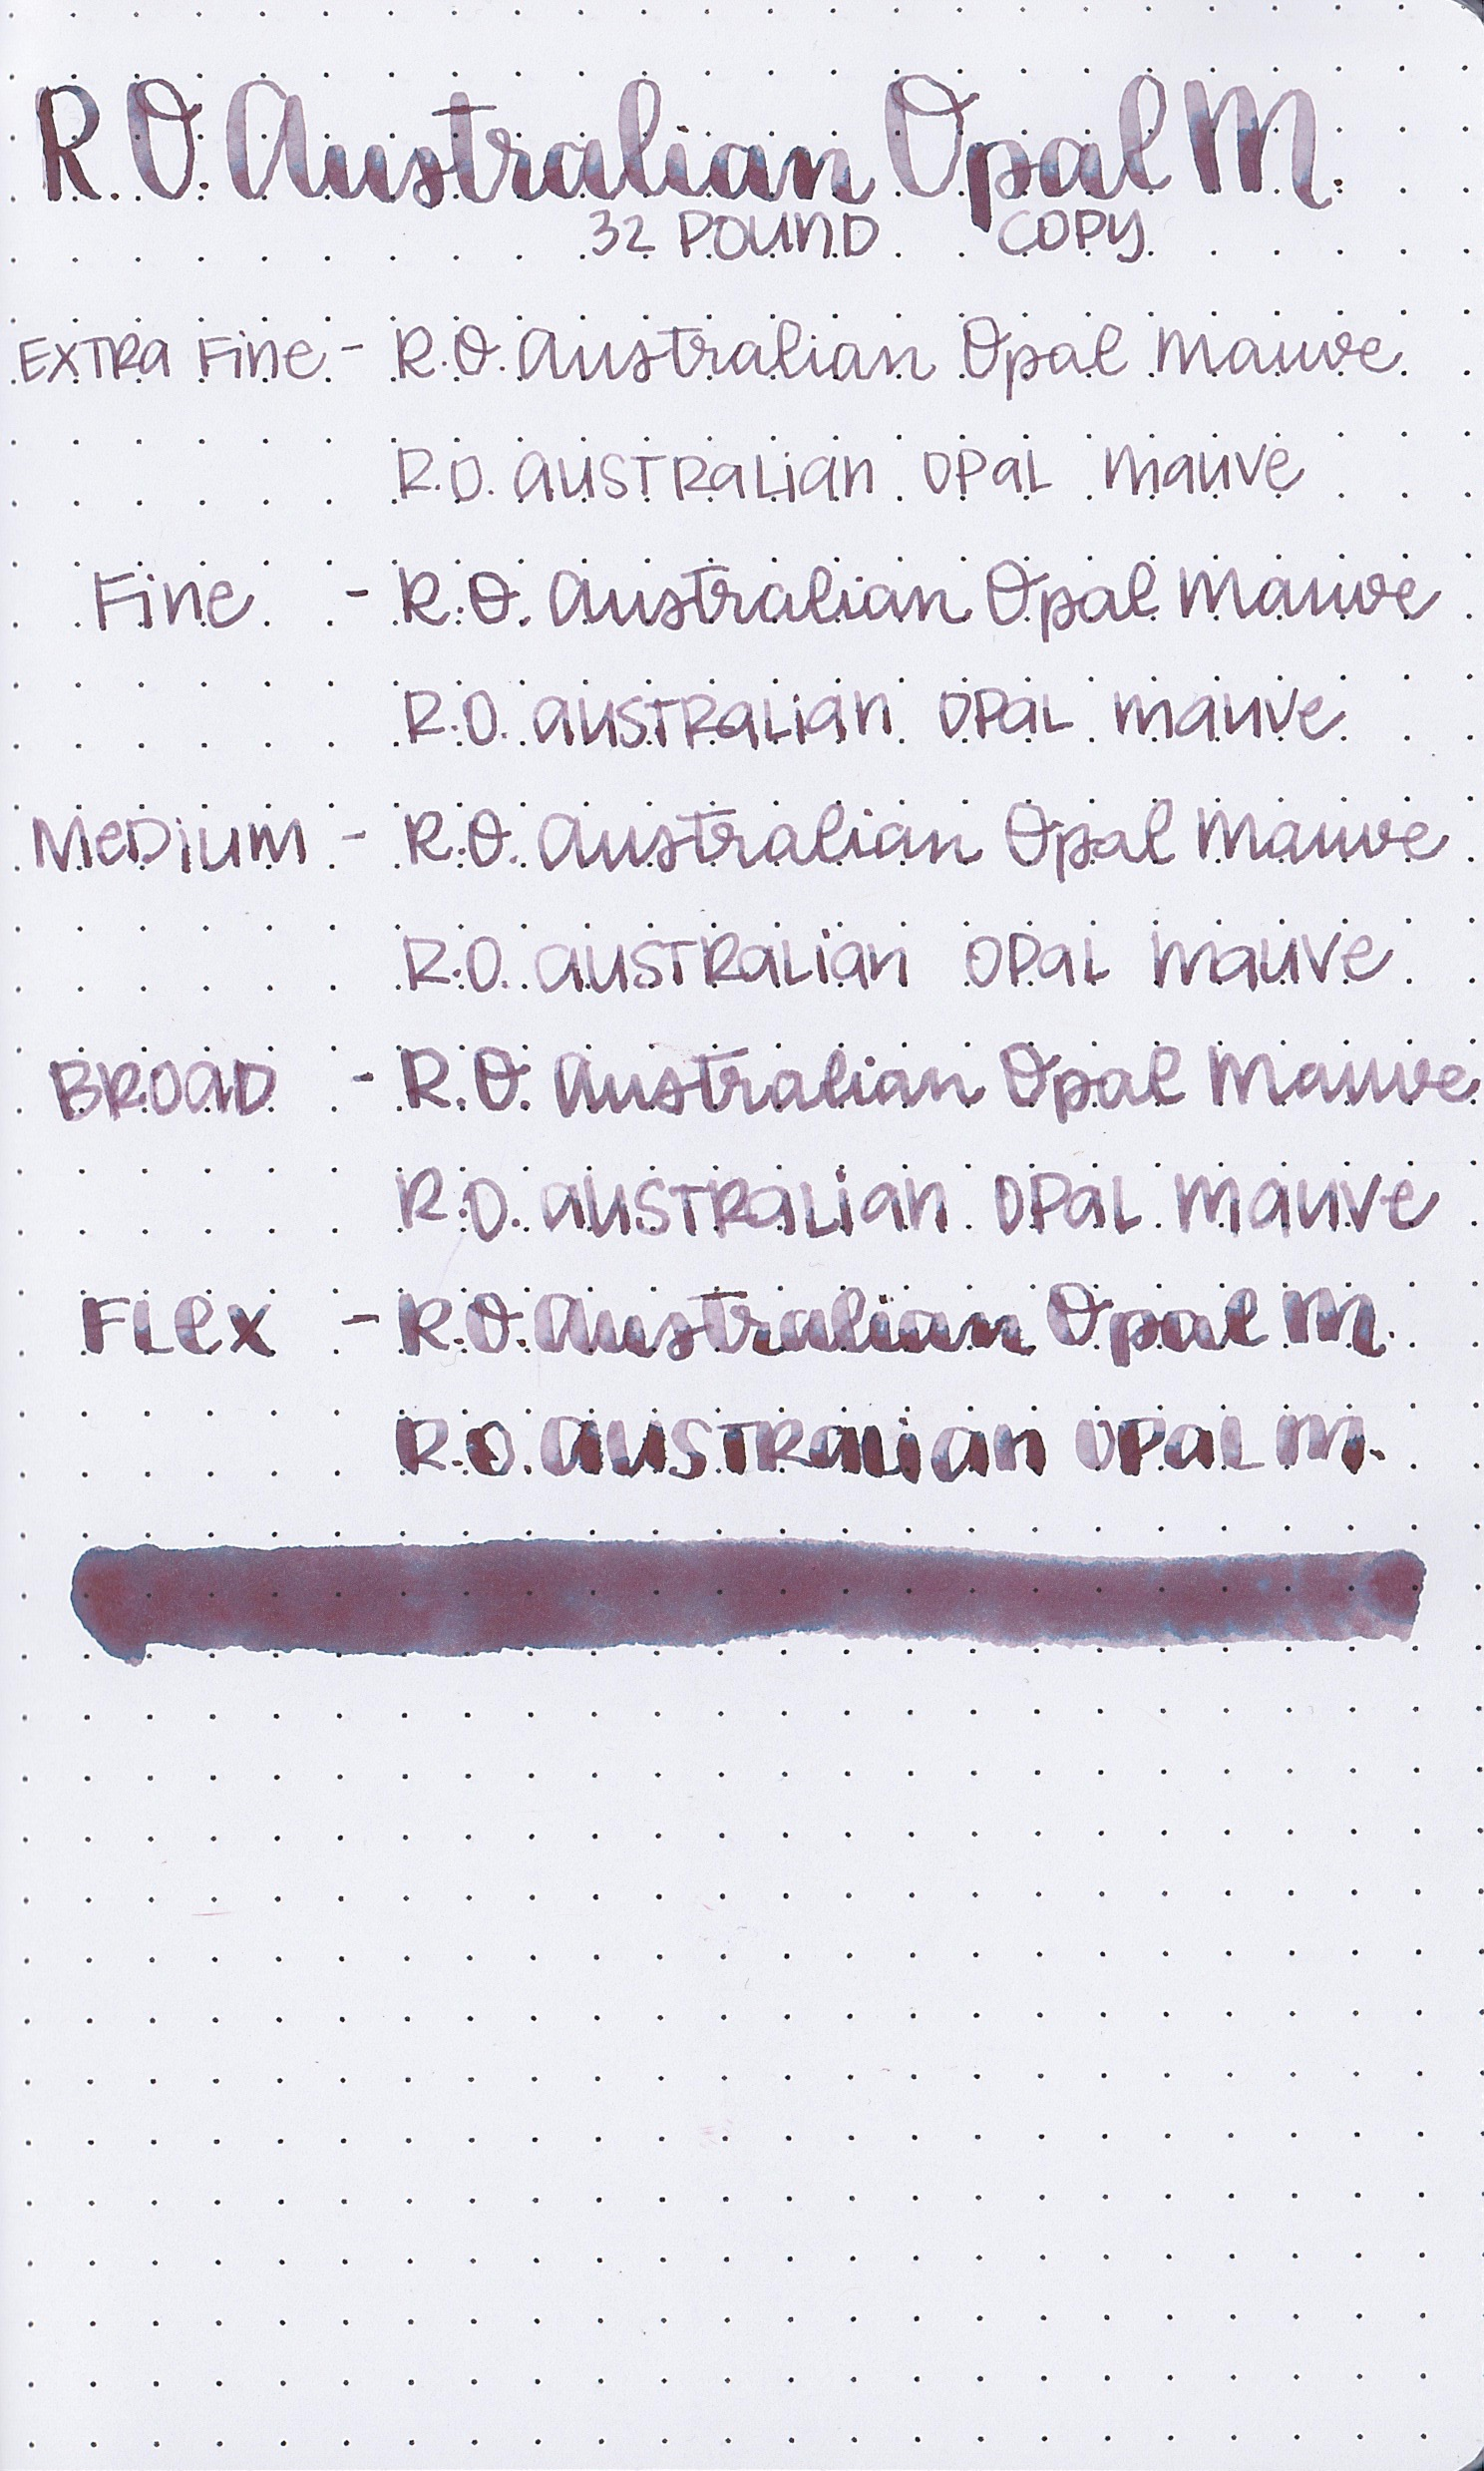 ROAustralianOpalMauve - 13.jpg